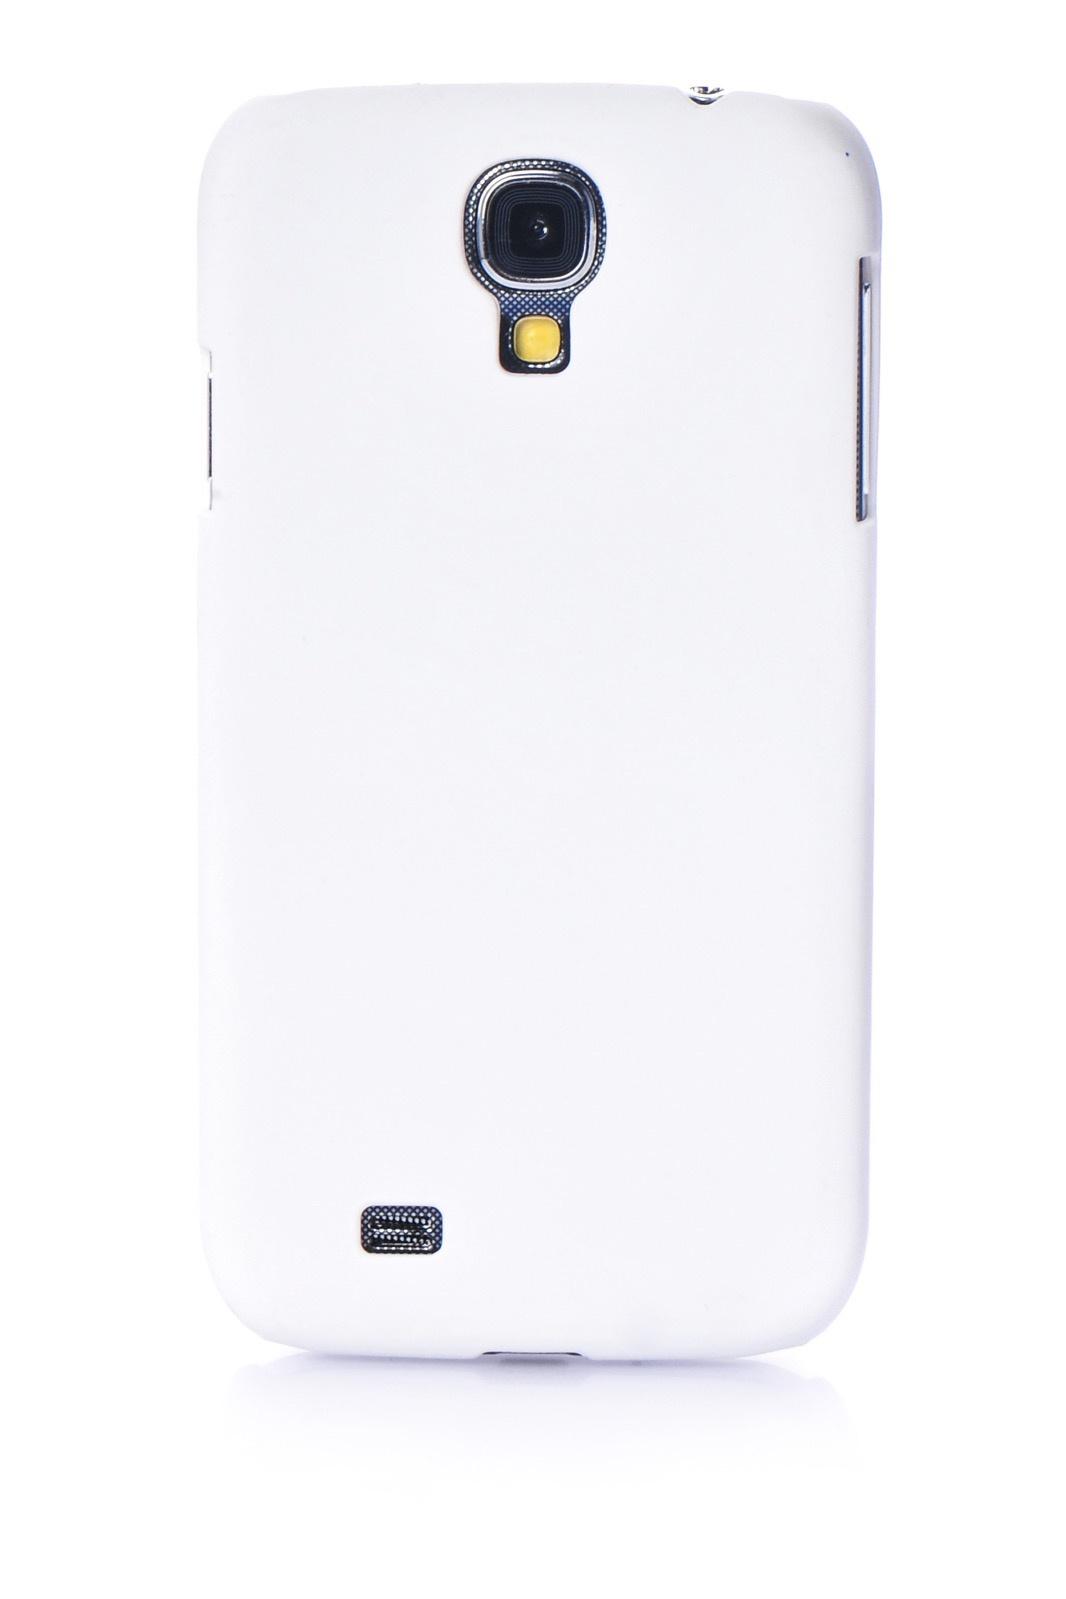 Чехол для сотового телефона Gurdini накладка пластик Soft touch 450087 для Samsung S4, белый